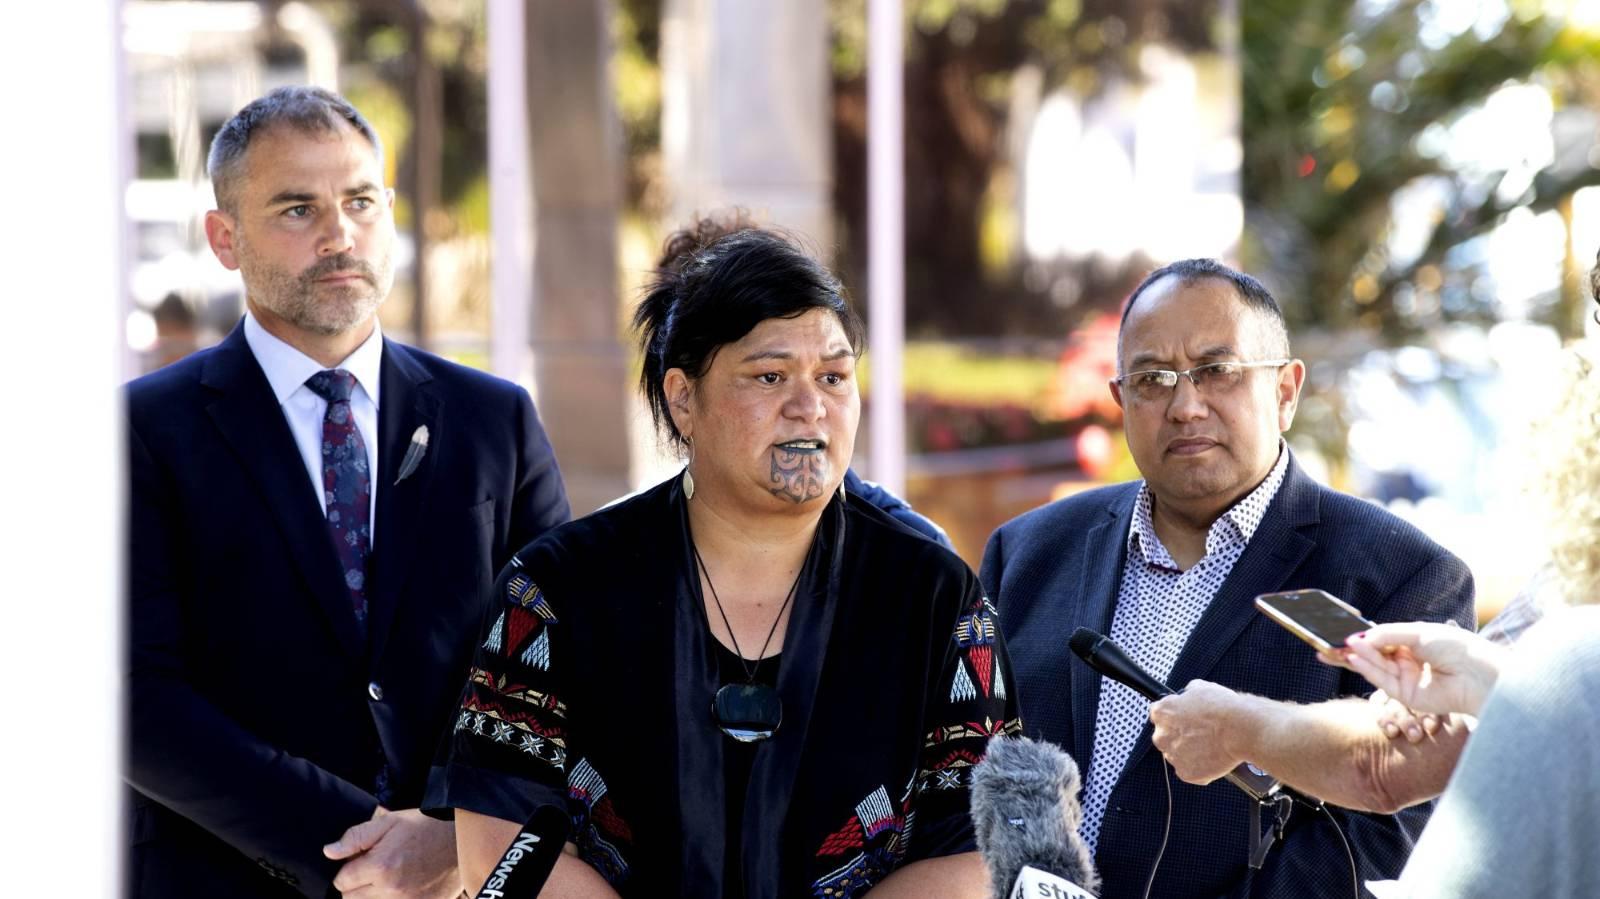 Steps made to establish Māori Wards